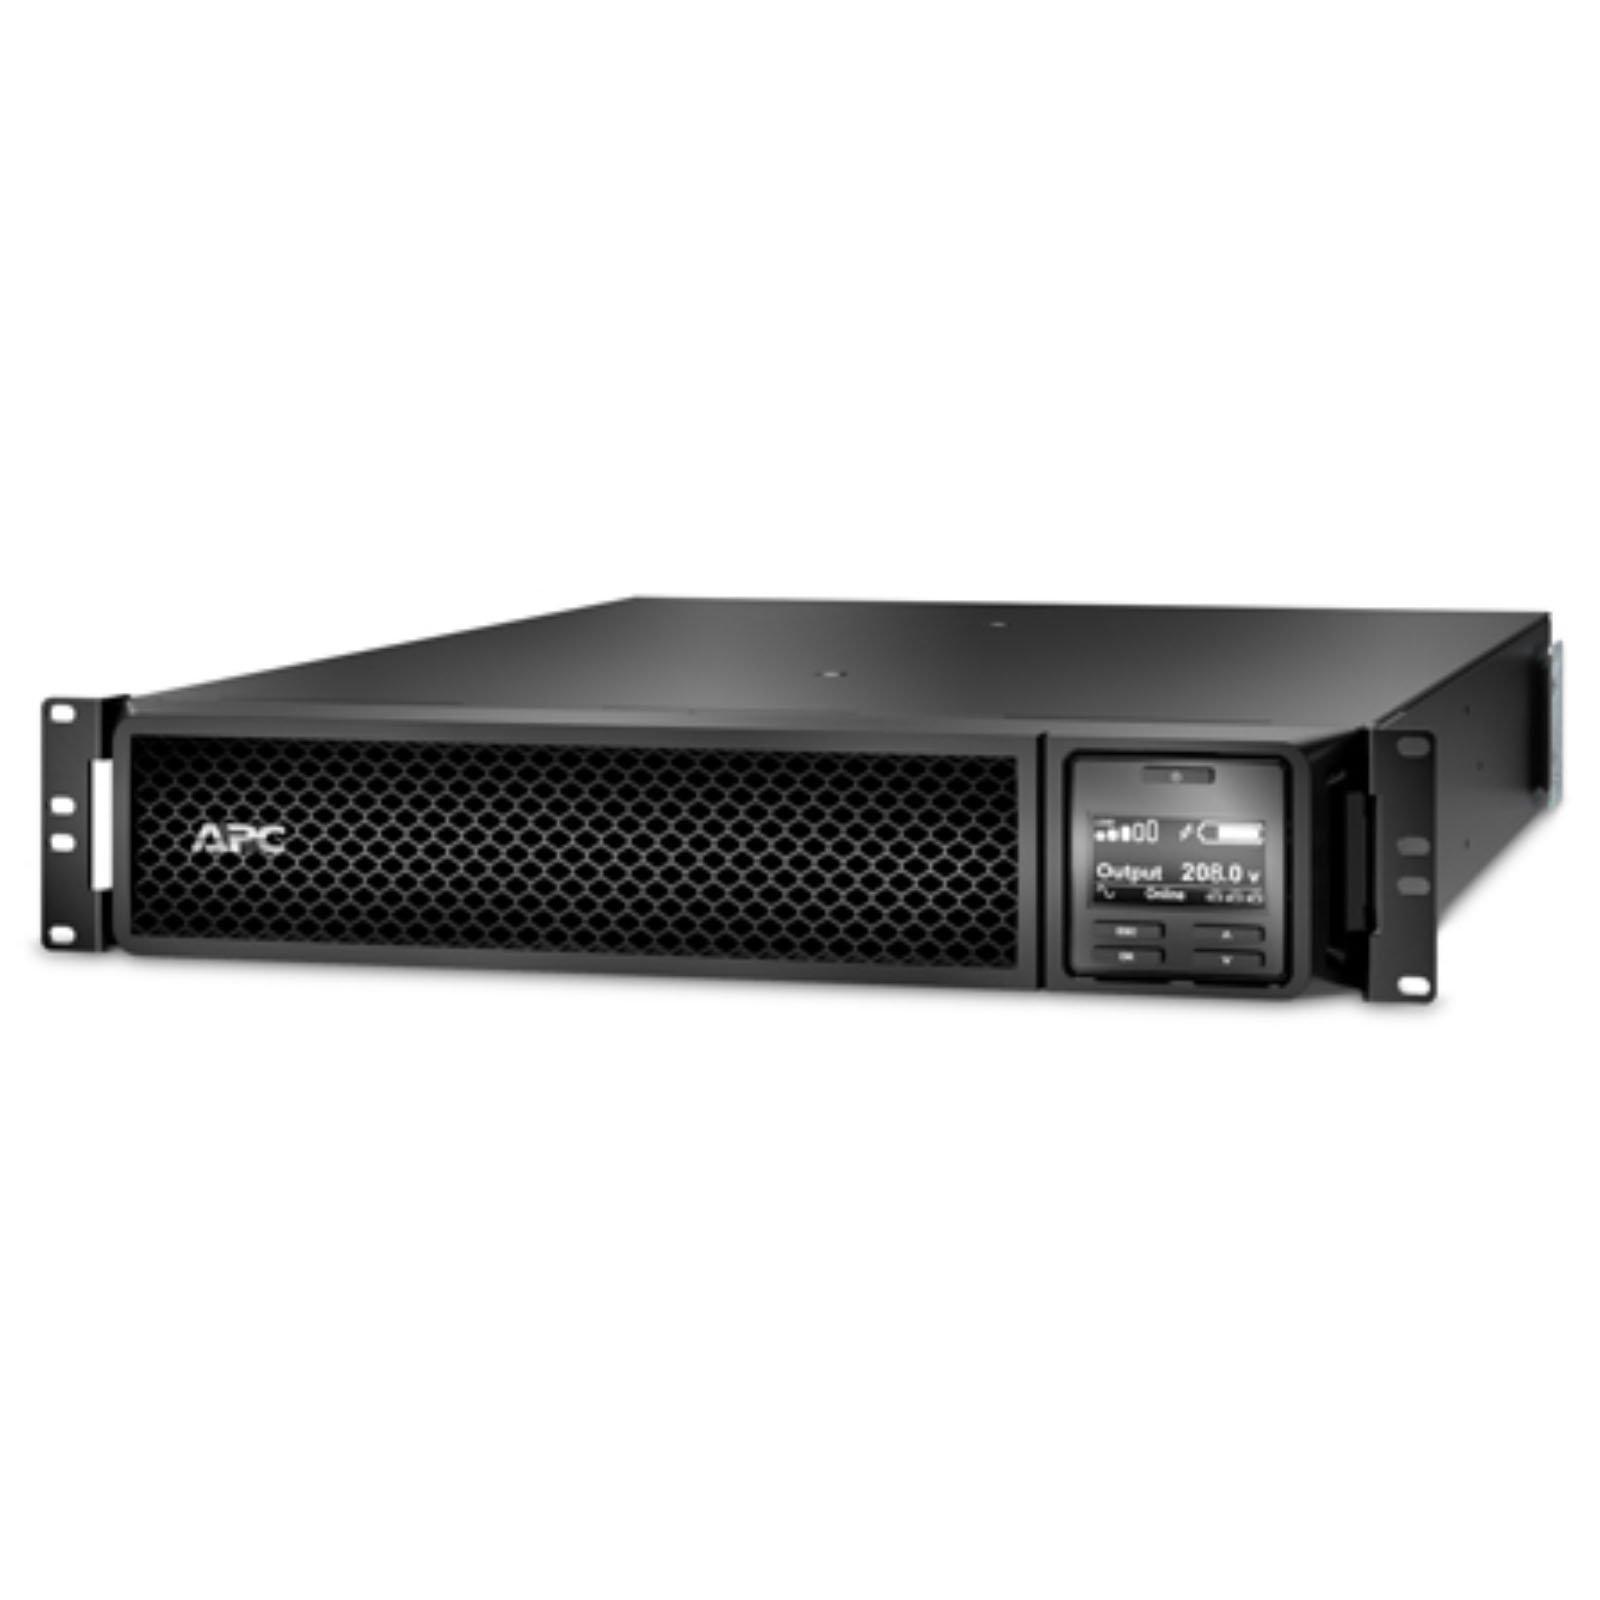 apc by Schneider Electric SRT3000RMXLT 3kVA 208V Smart UPS SRT 12 Power Supply SRT3000RMXLT